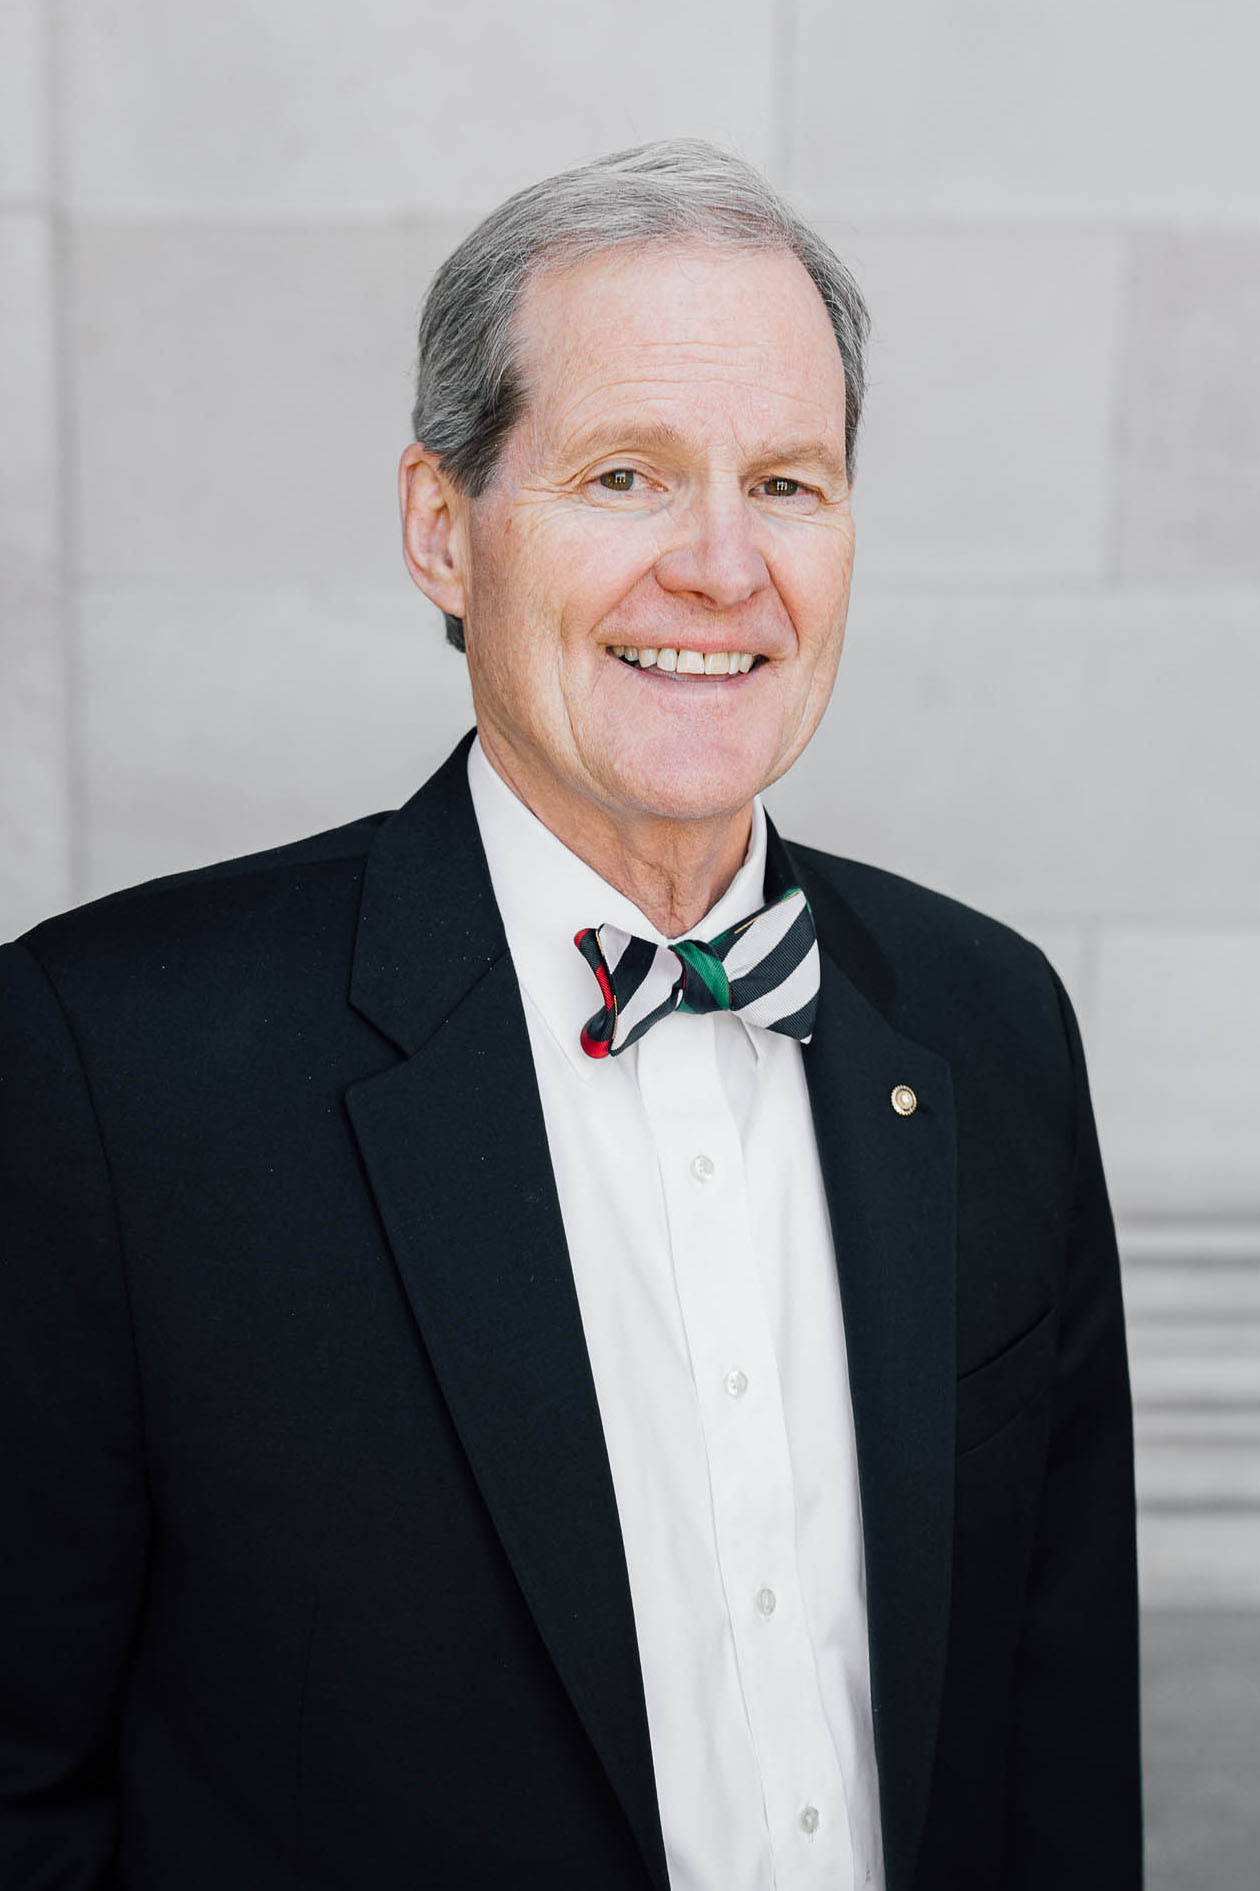 Stephen J. Henderson